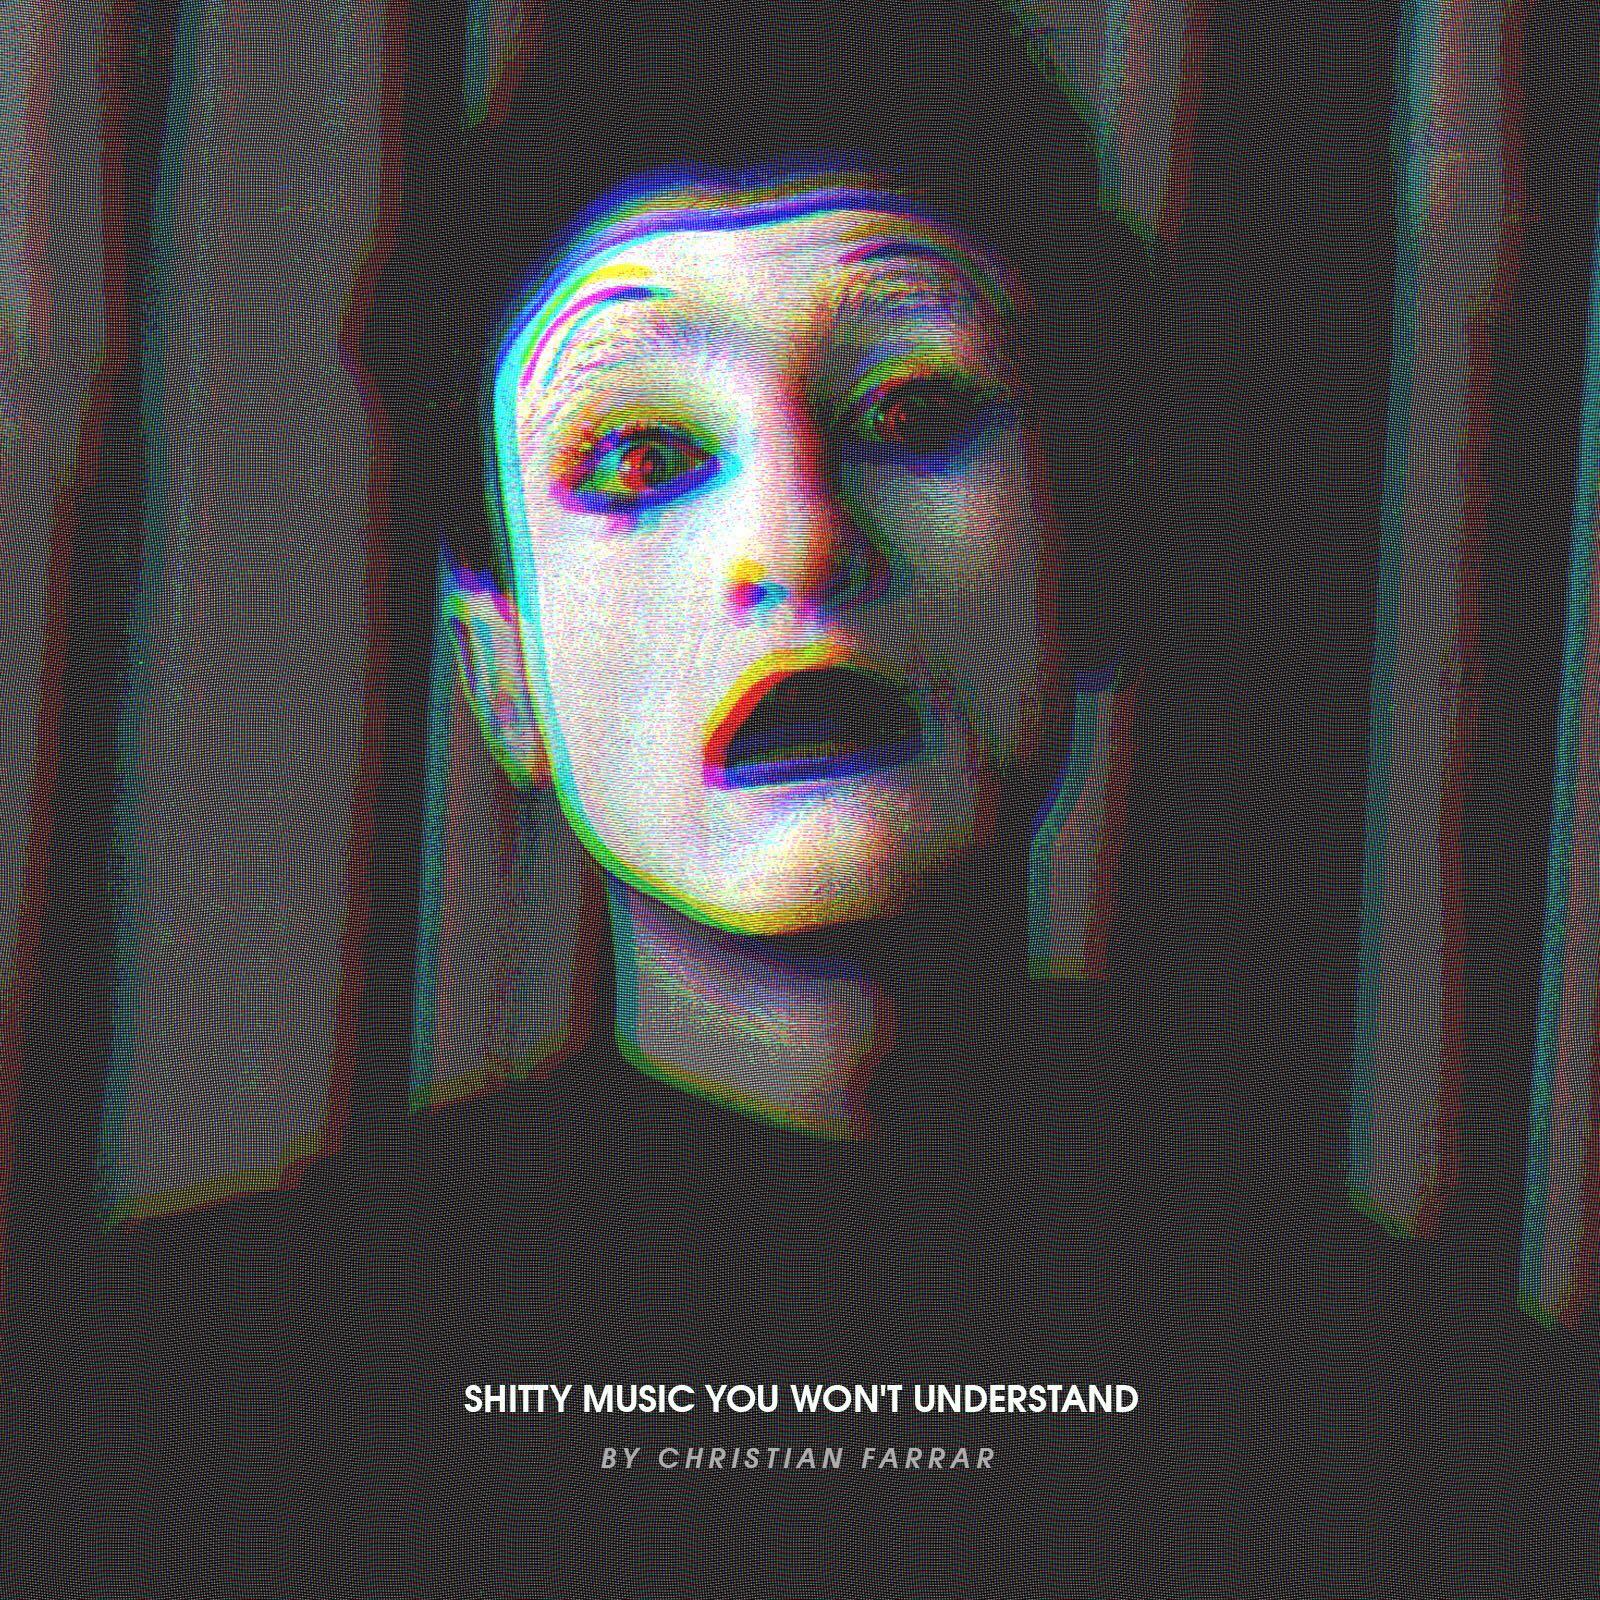 Christian Farrar – Shitty Music You Won't Understand